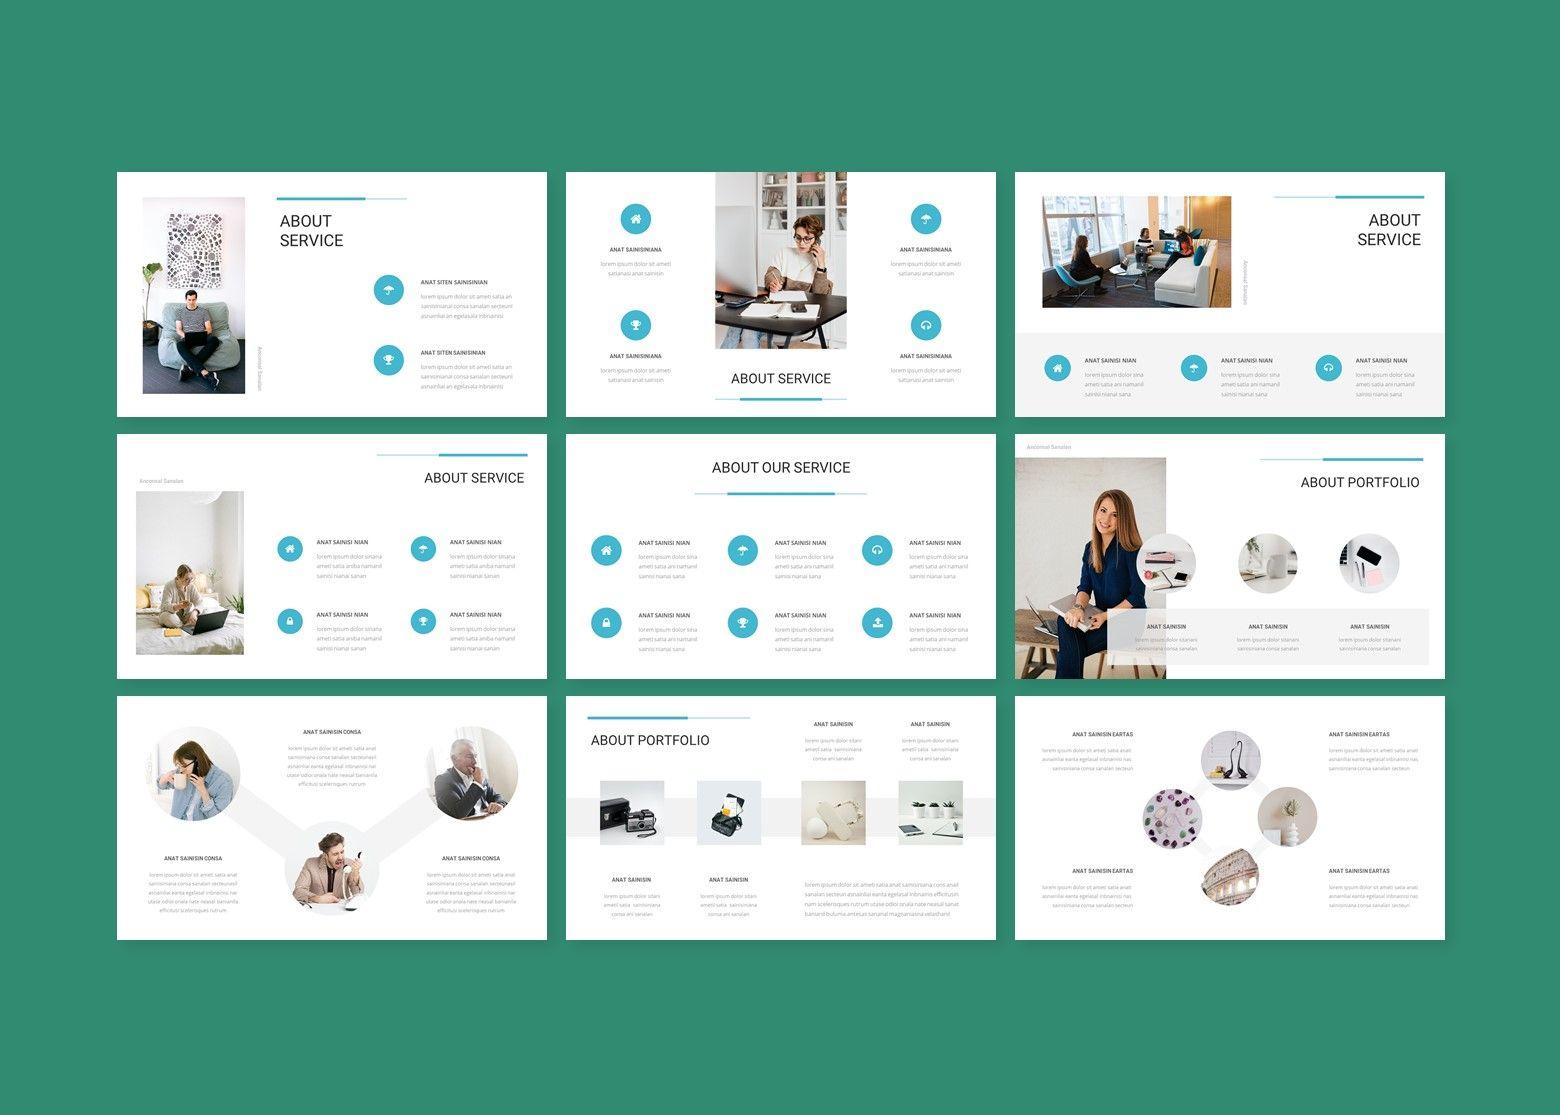 Aion Corporate Google Slides Template, Slide 3, 08151, Business Models — PoweredTemplate.com